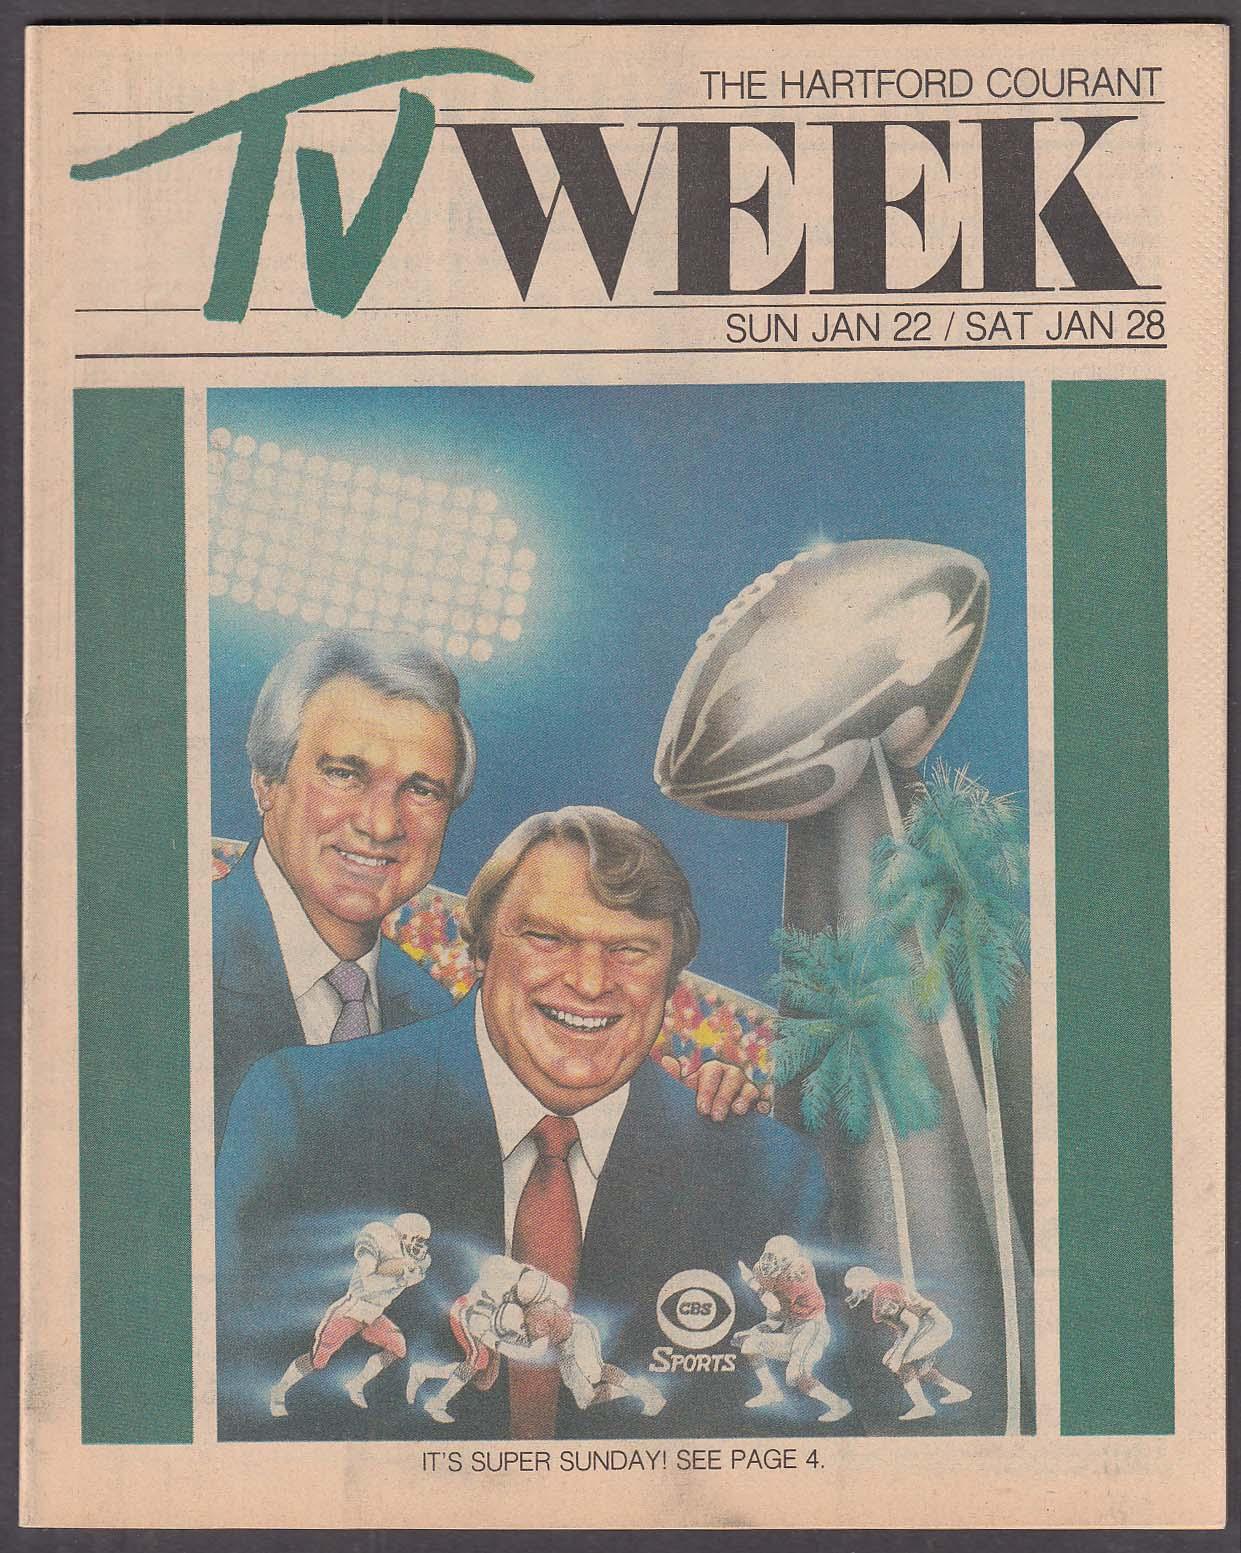 TV WEEK Summerall Madden Super Bowl Hartford Courant 1/22 1984